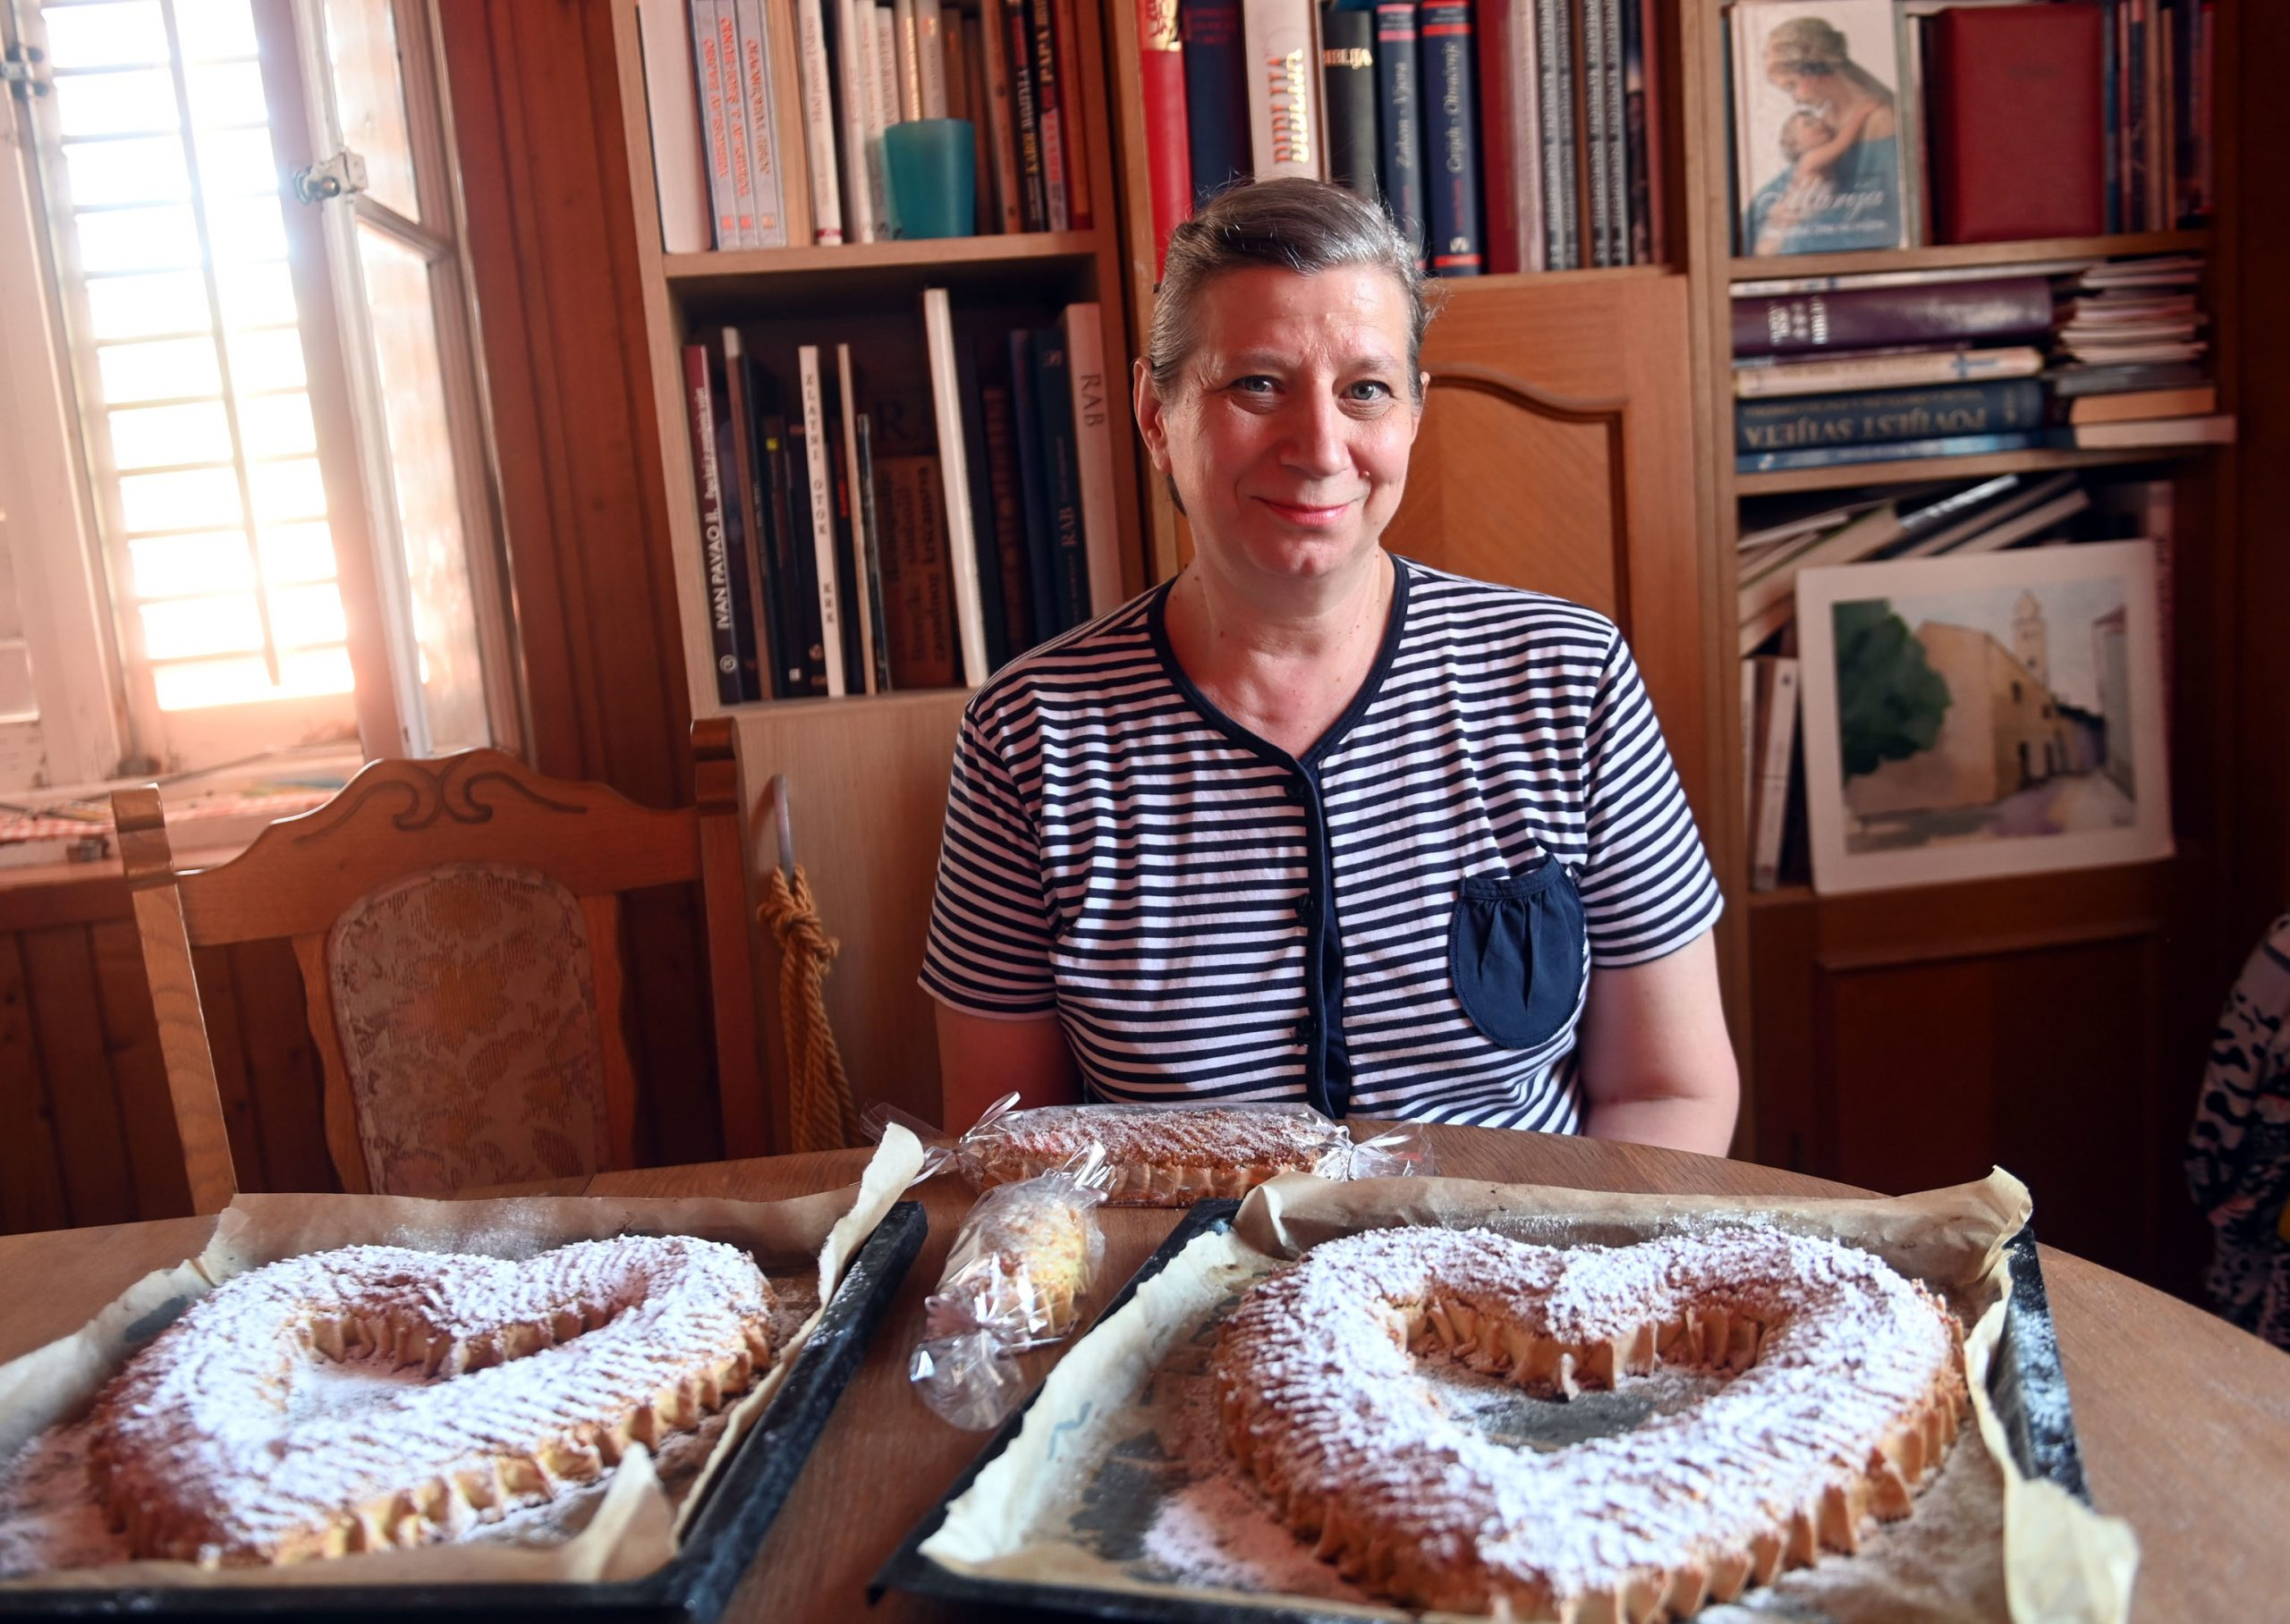 Dunja Brnjac s rapskom tortom u obliku srca i štangica / Foto Vedran Karuza